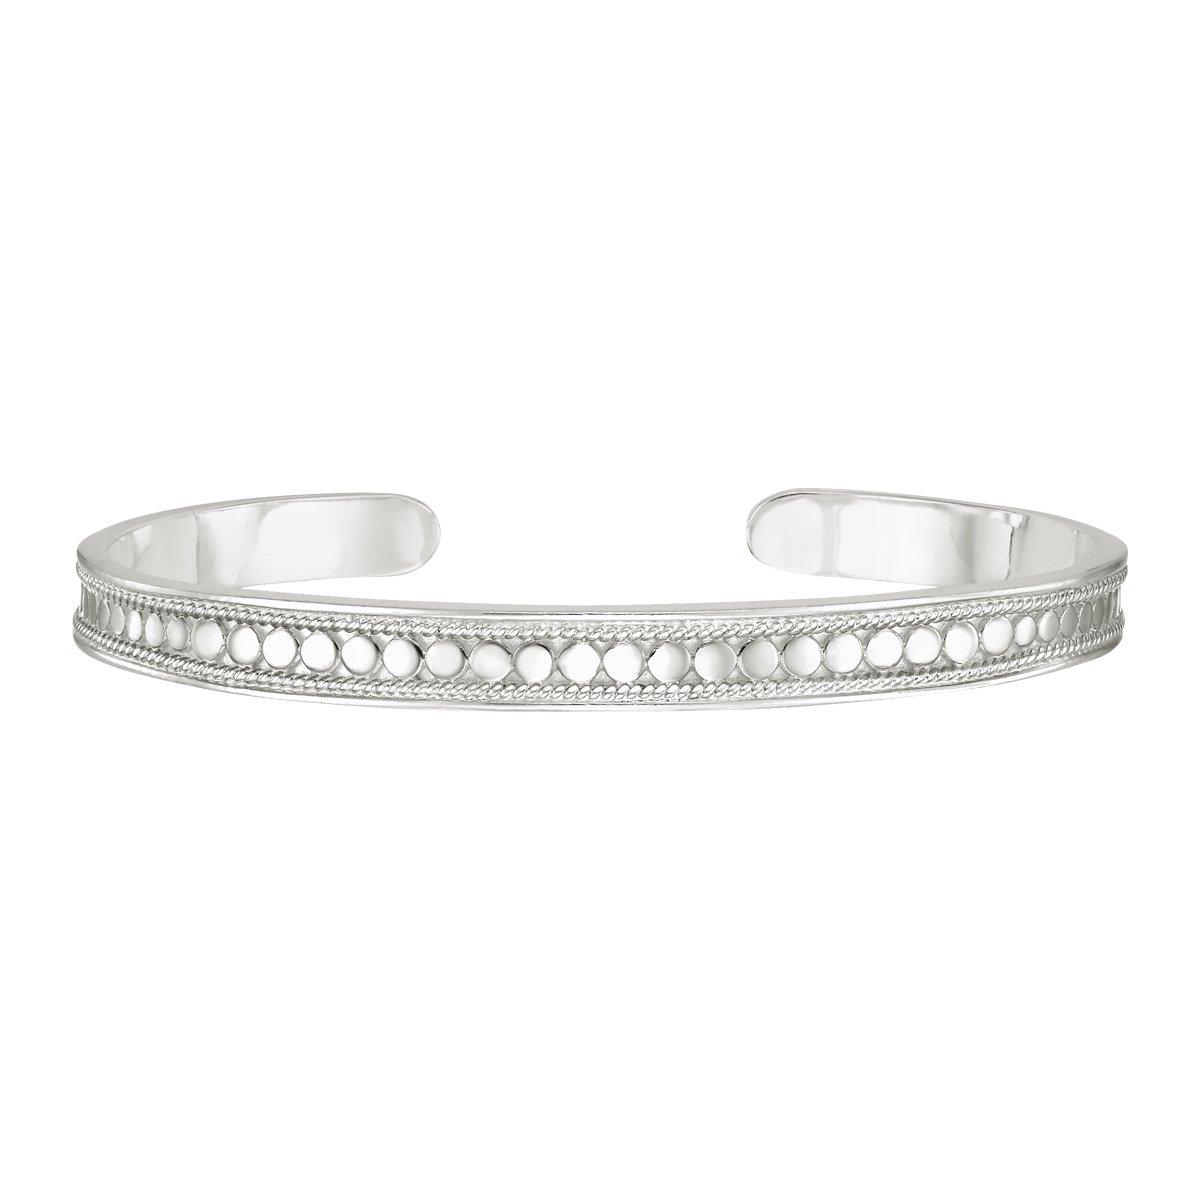 Anna Beck Sterling Silver Skinny Cuff Bracelet